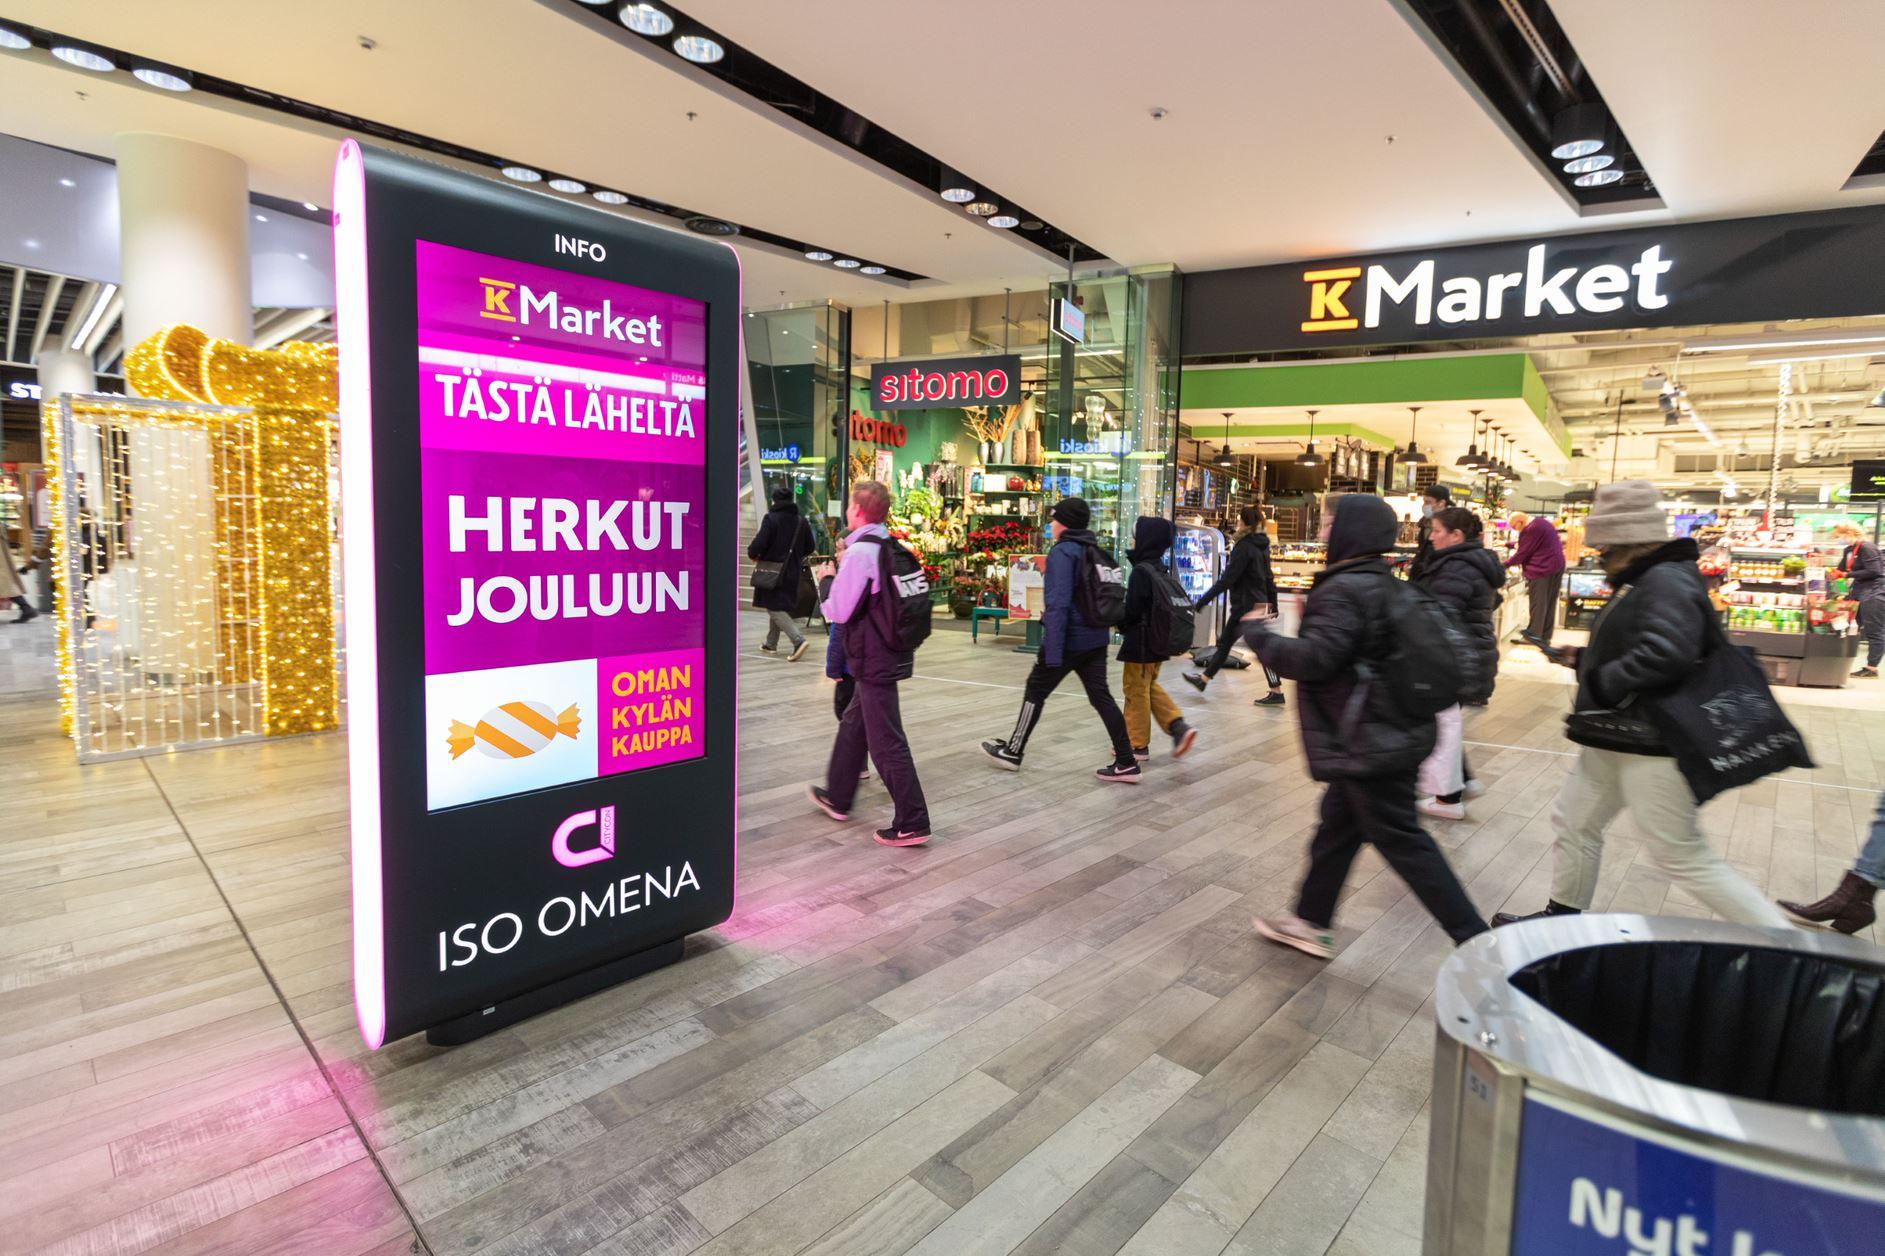 Espoo - Iso Omena Promotion Places